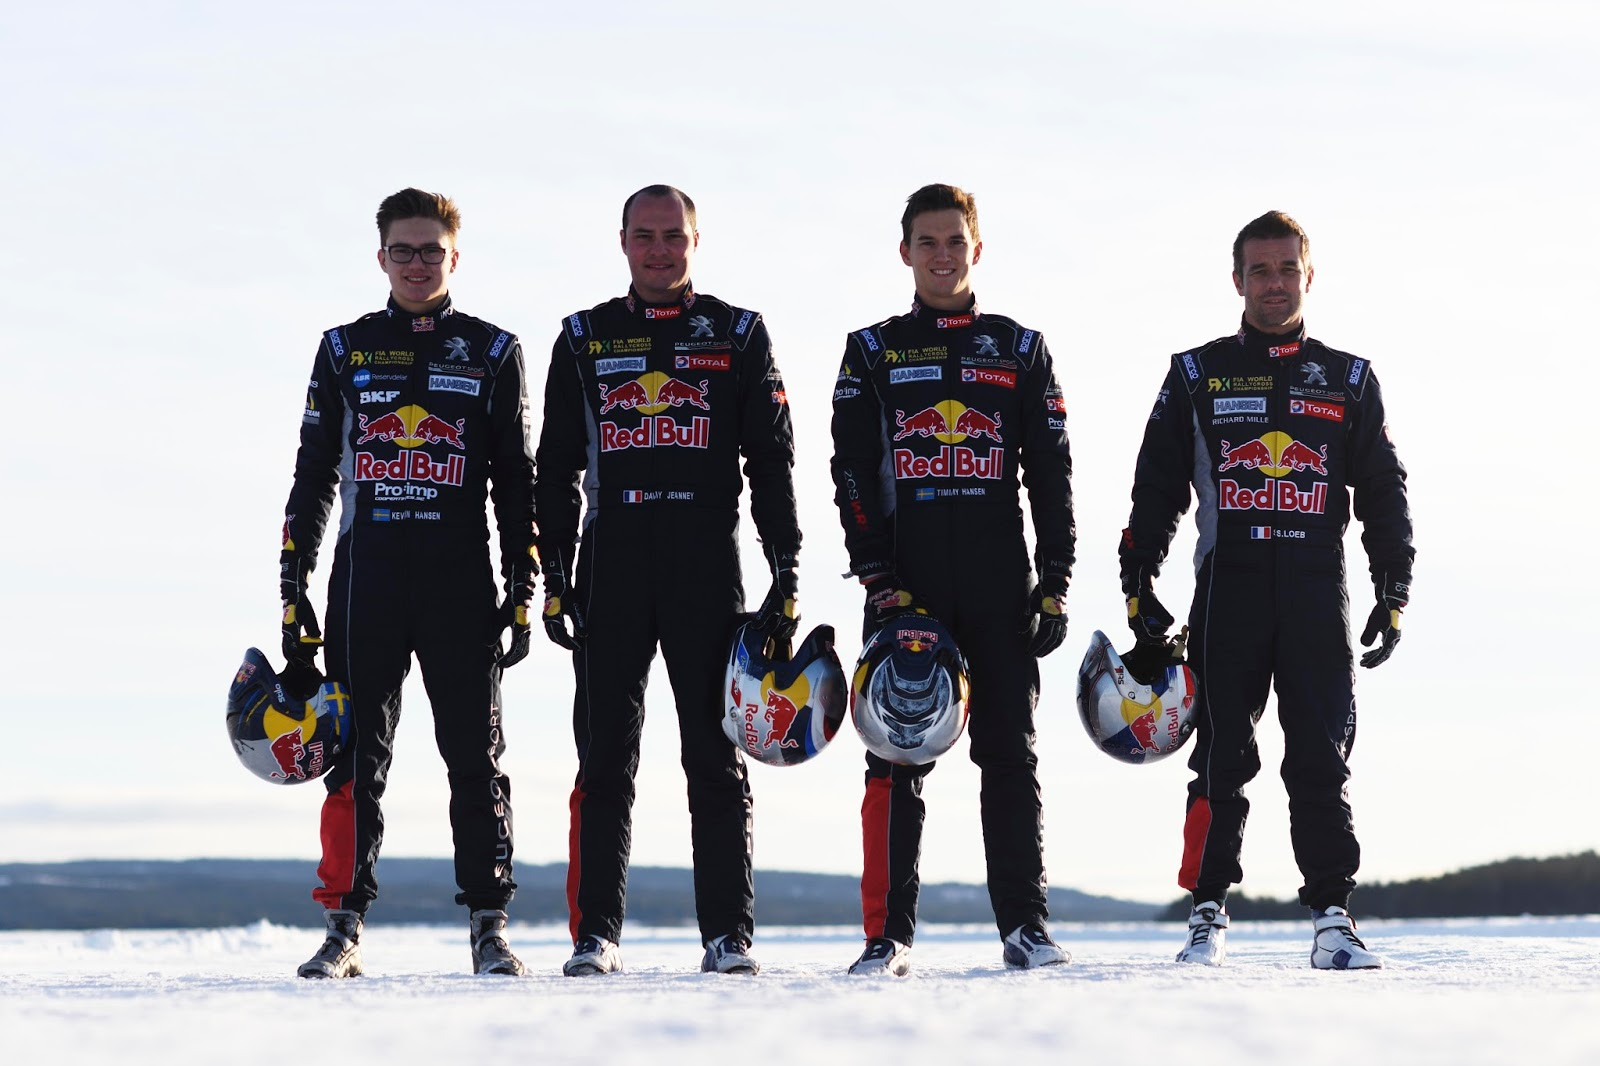 SI201602210127 hires jpeg 24bit rgb Ο Sebastien Loeb θα συμμετέχει σε όλο το φετινό πρωτάθλημα Rallycross! PEUGEOT 208 WRΧ, Peugeot Sport, Rally, Rallycross, Sebastien Loeb, Timmy Hansen, videos, World RX, WRC, zblog